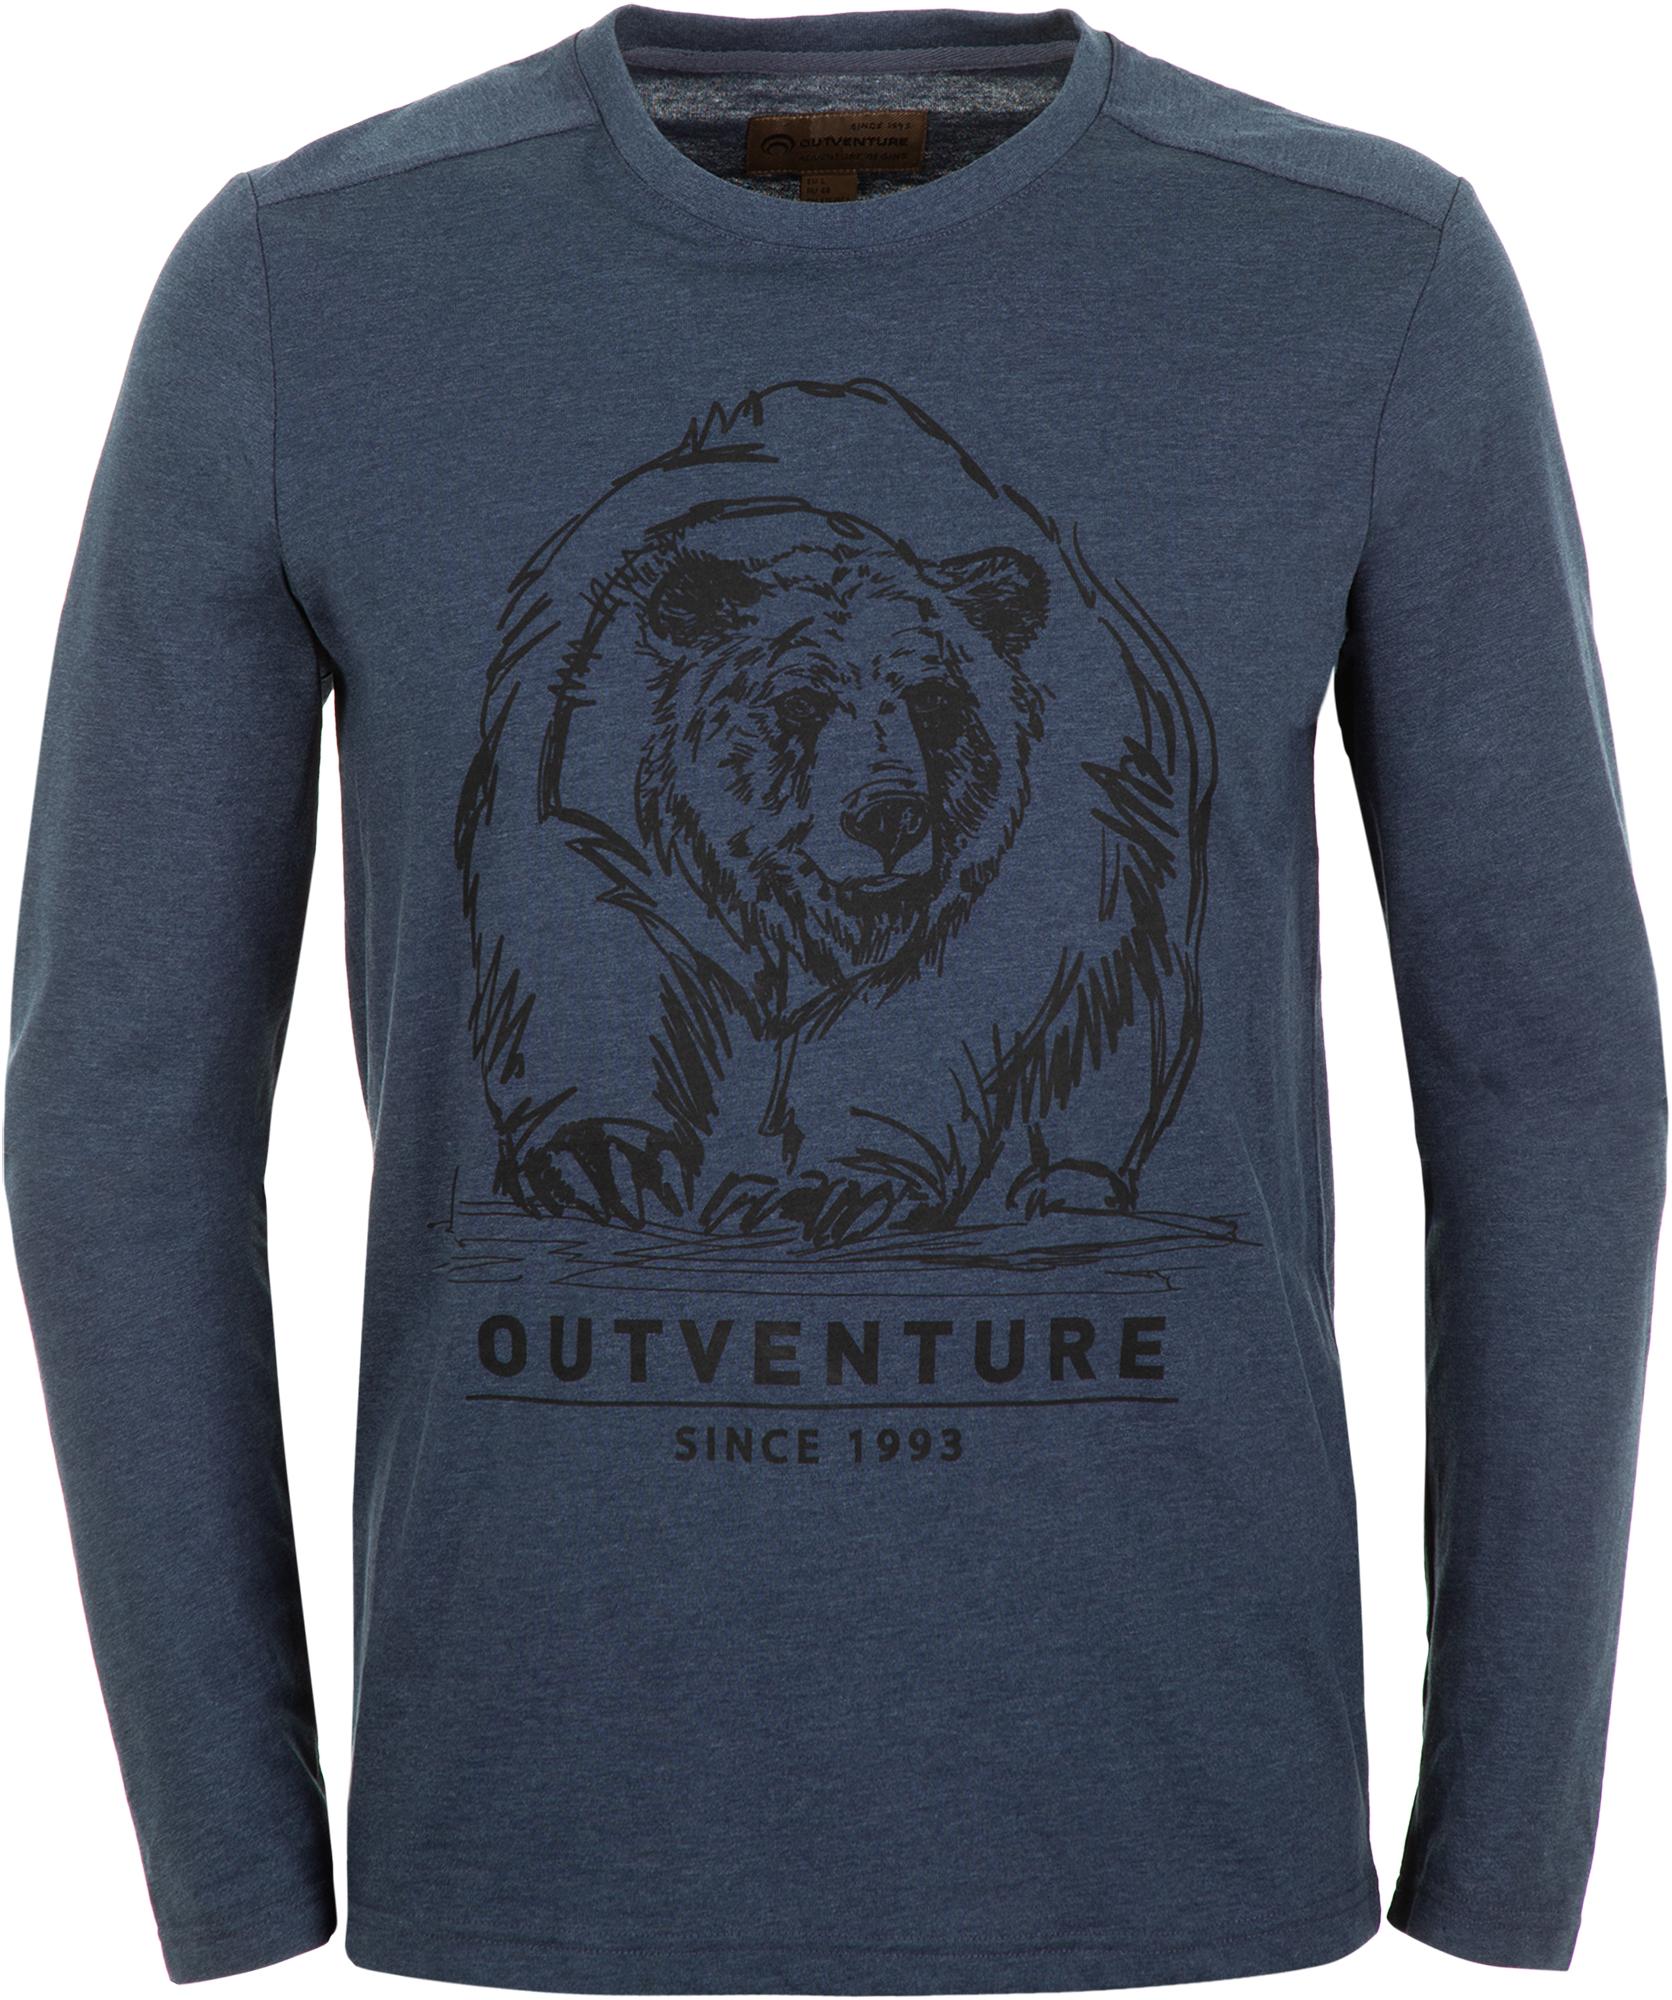 цена на Outventure Лонгслив мужской Outventure, размер 48